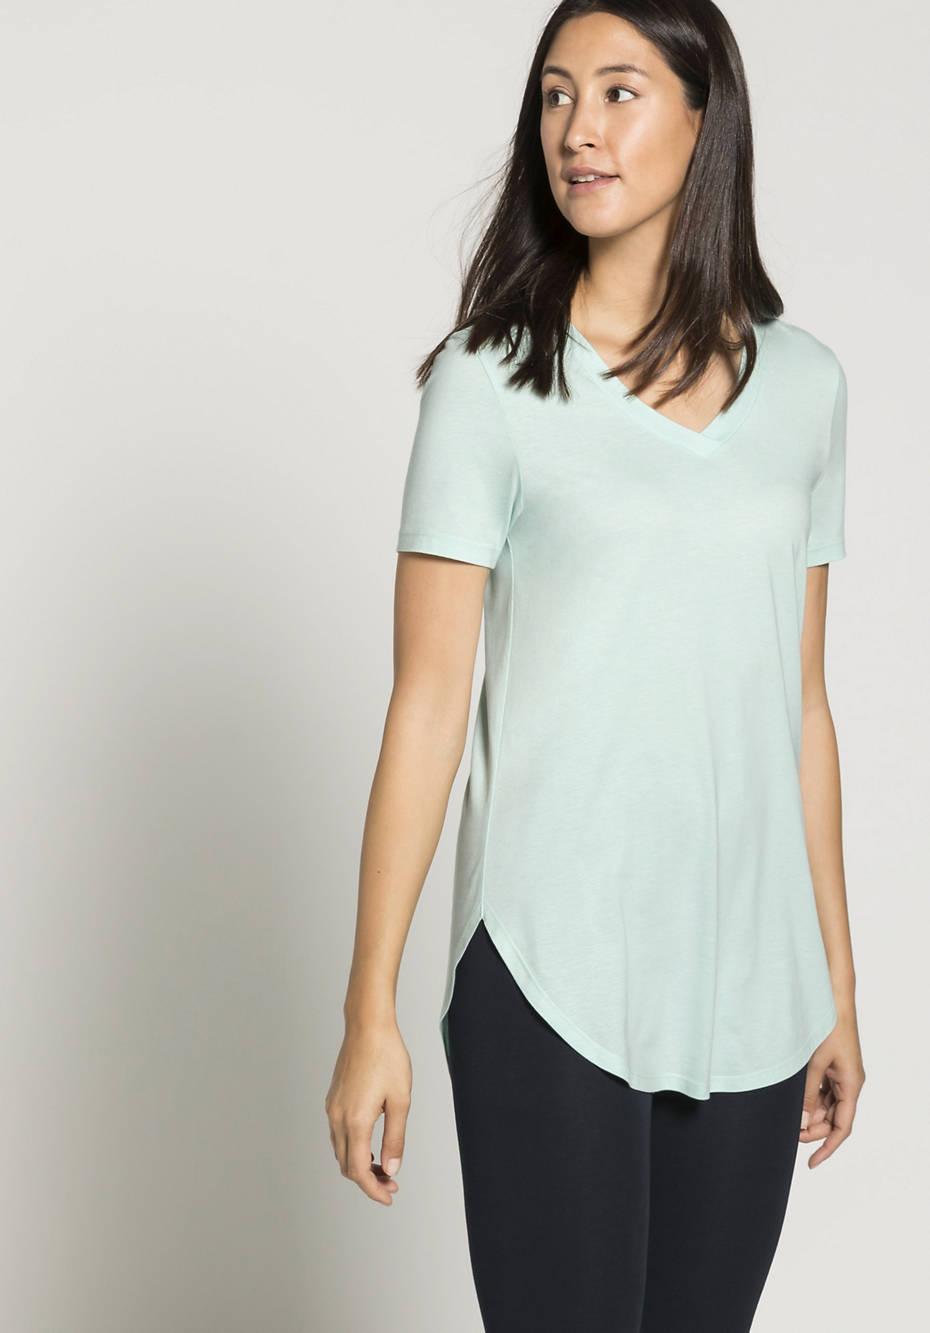 Long shirt made of organic cotton and TENCEL ™ Modal